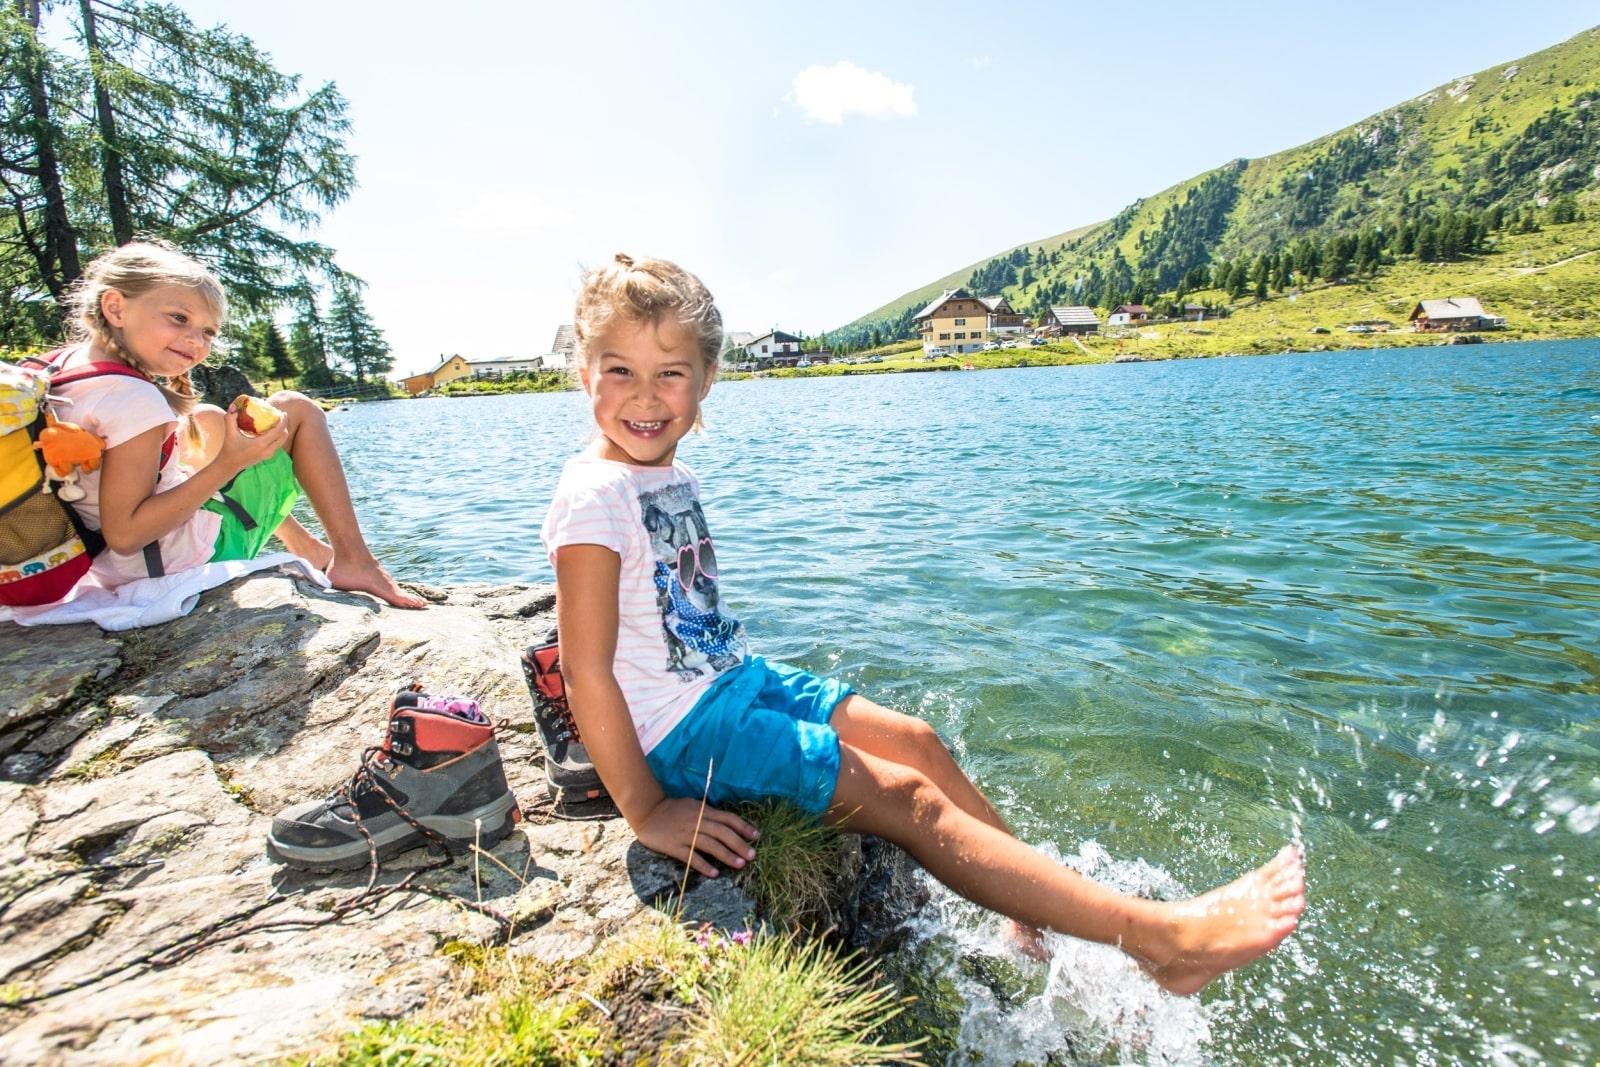 Heidi-Chalet-Falkert-Heidialm-Falkertsee-Kinder-Spass